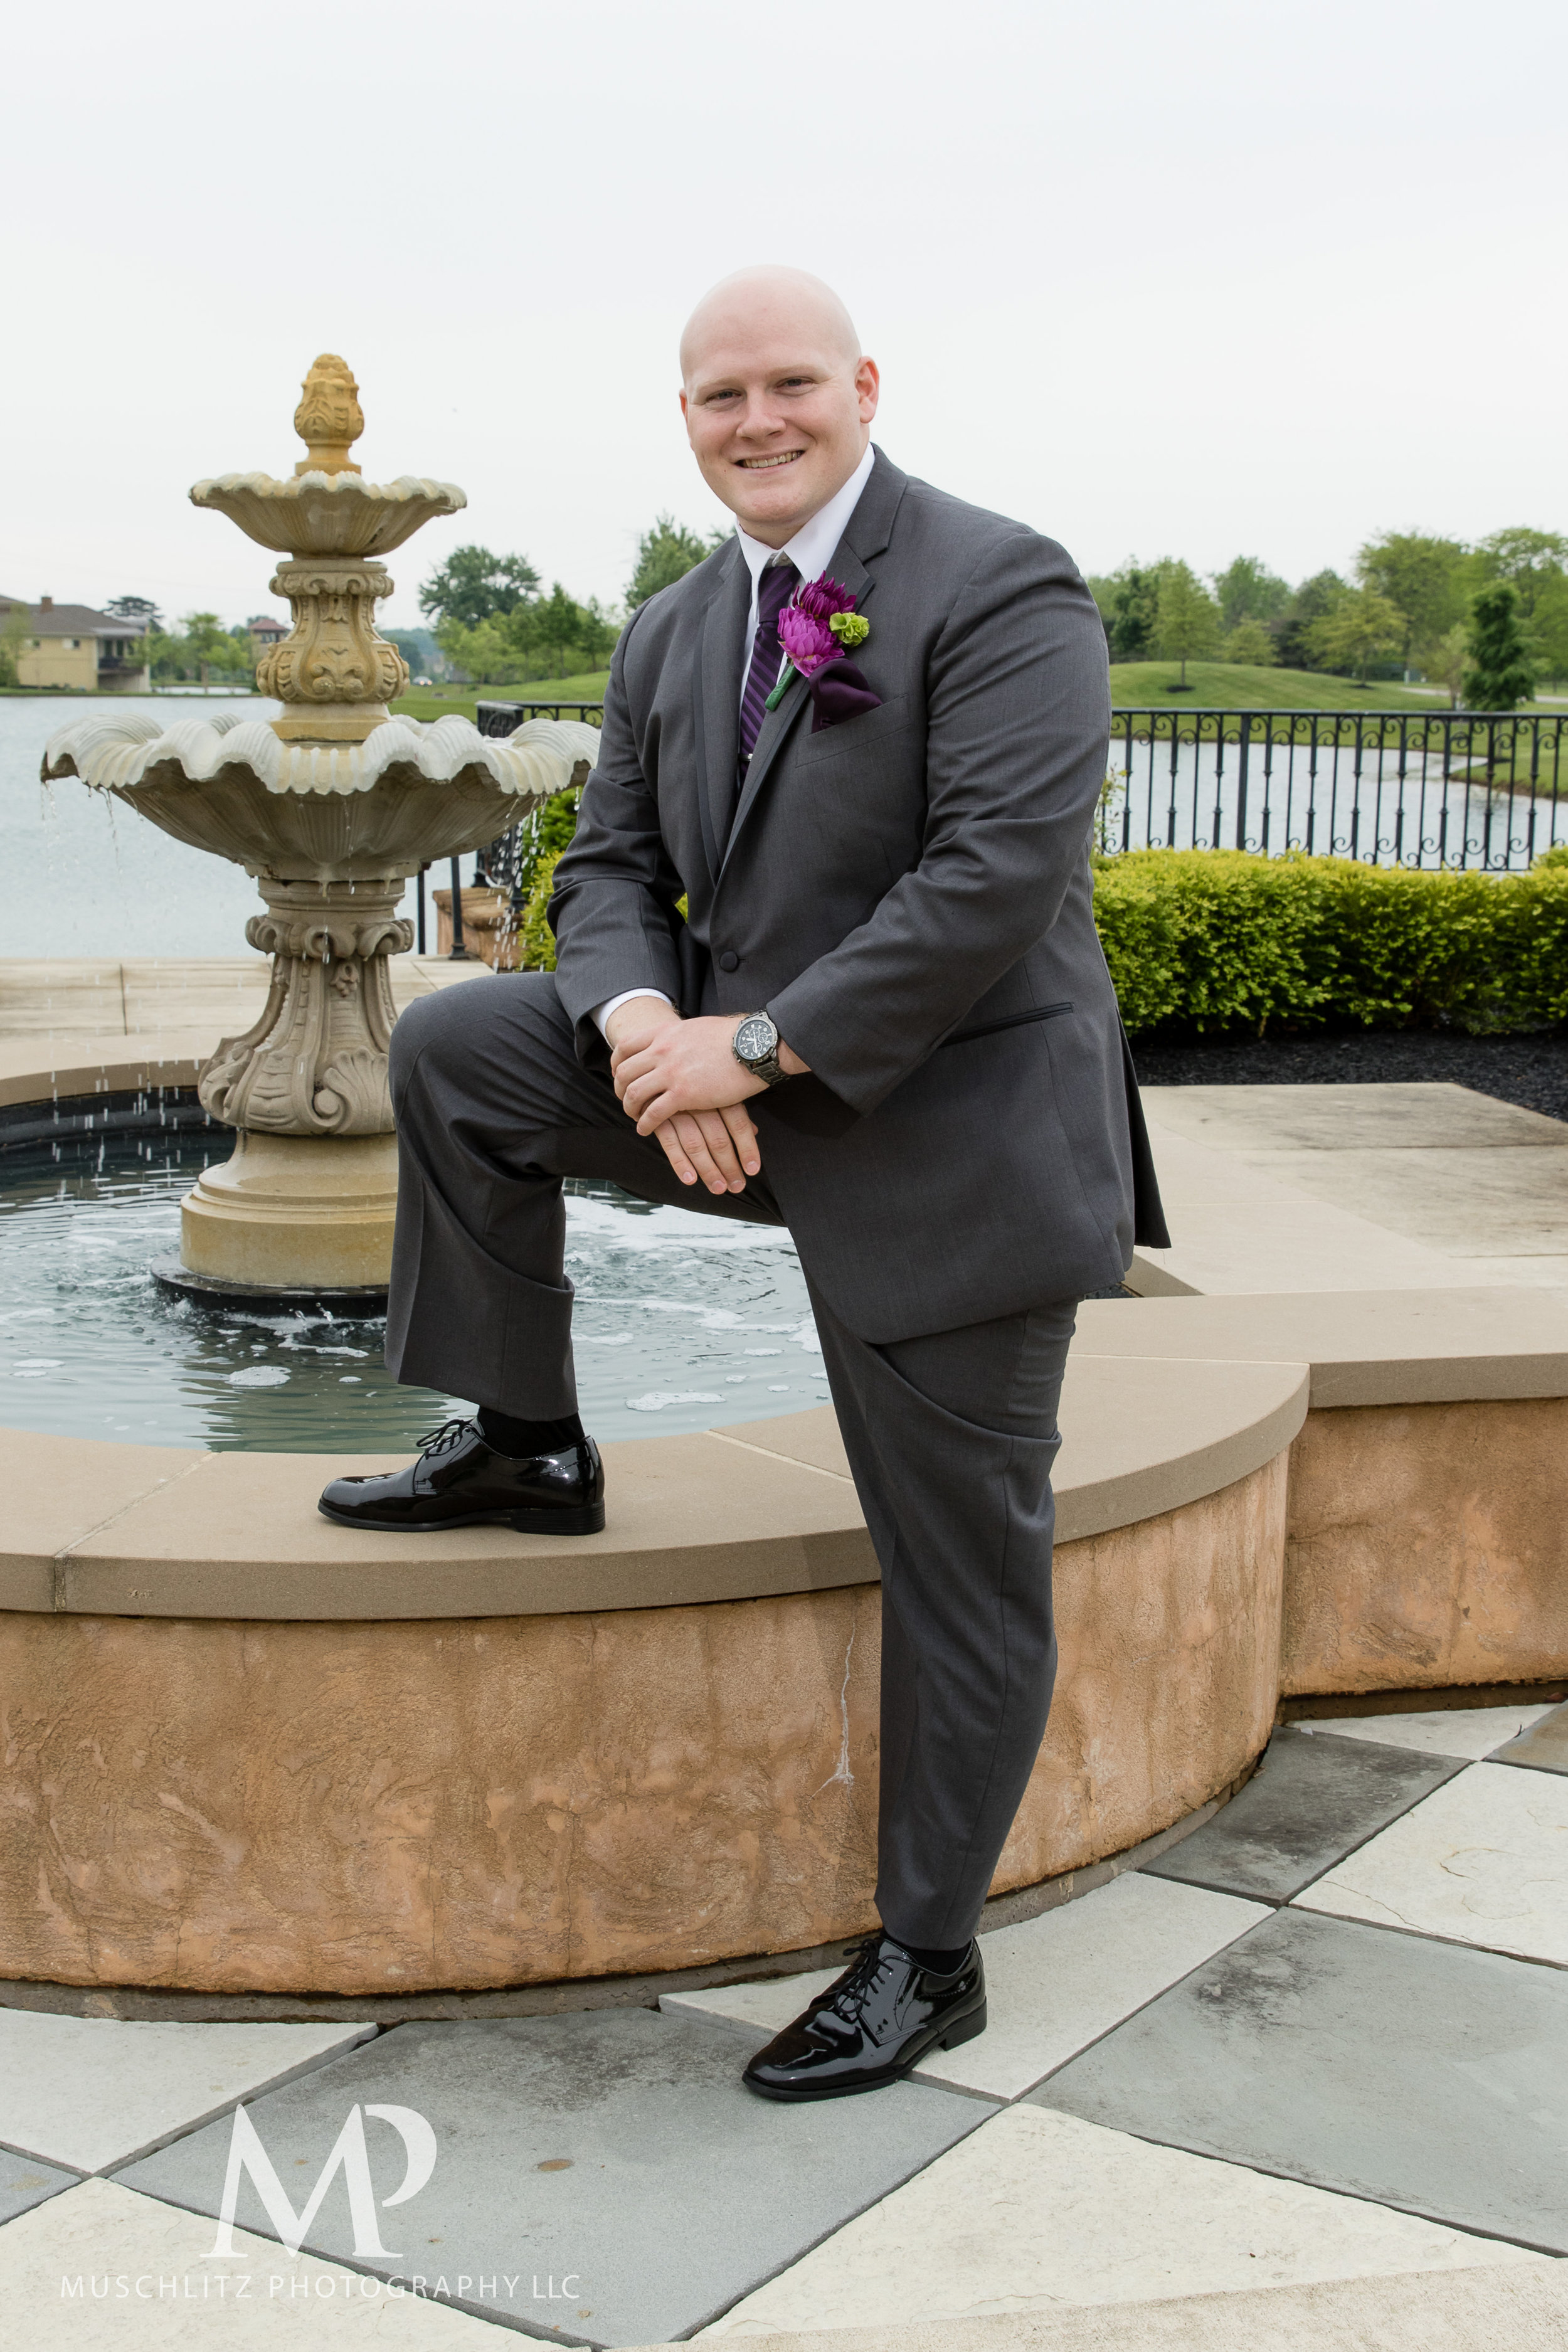 club-at-corazon-wedding-ceremony-reception-columbus-dublin-ohio-ohio-university-theme-049.JPG